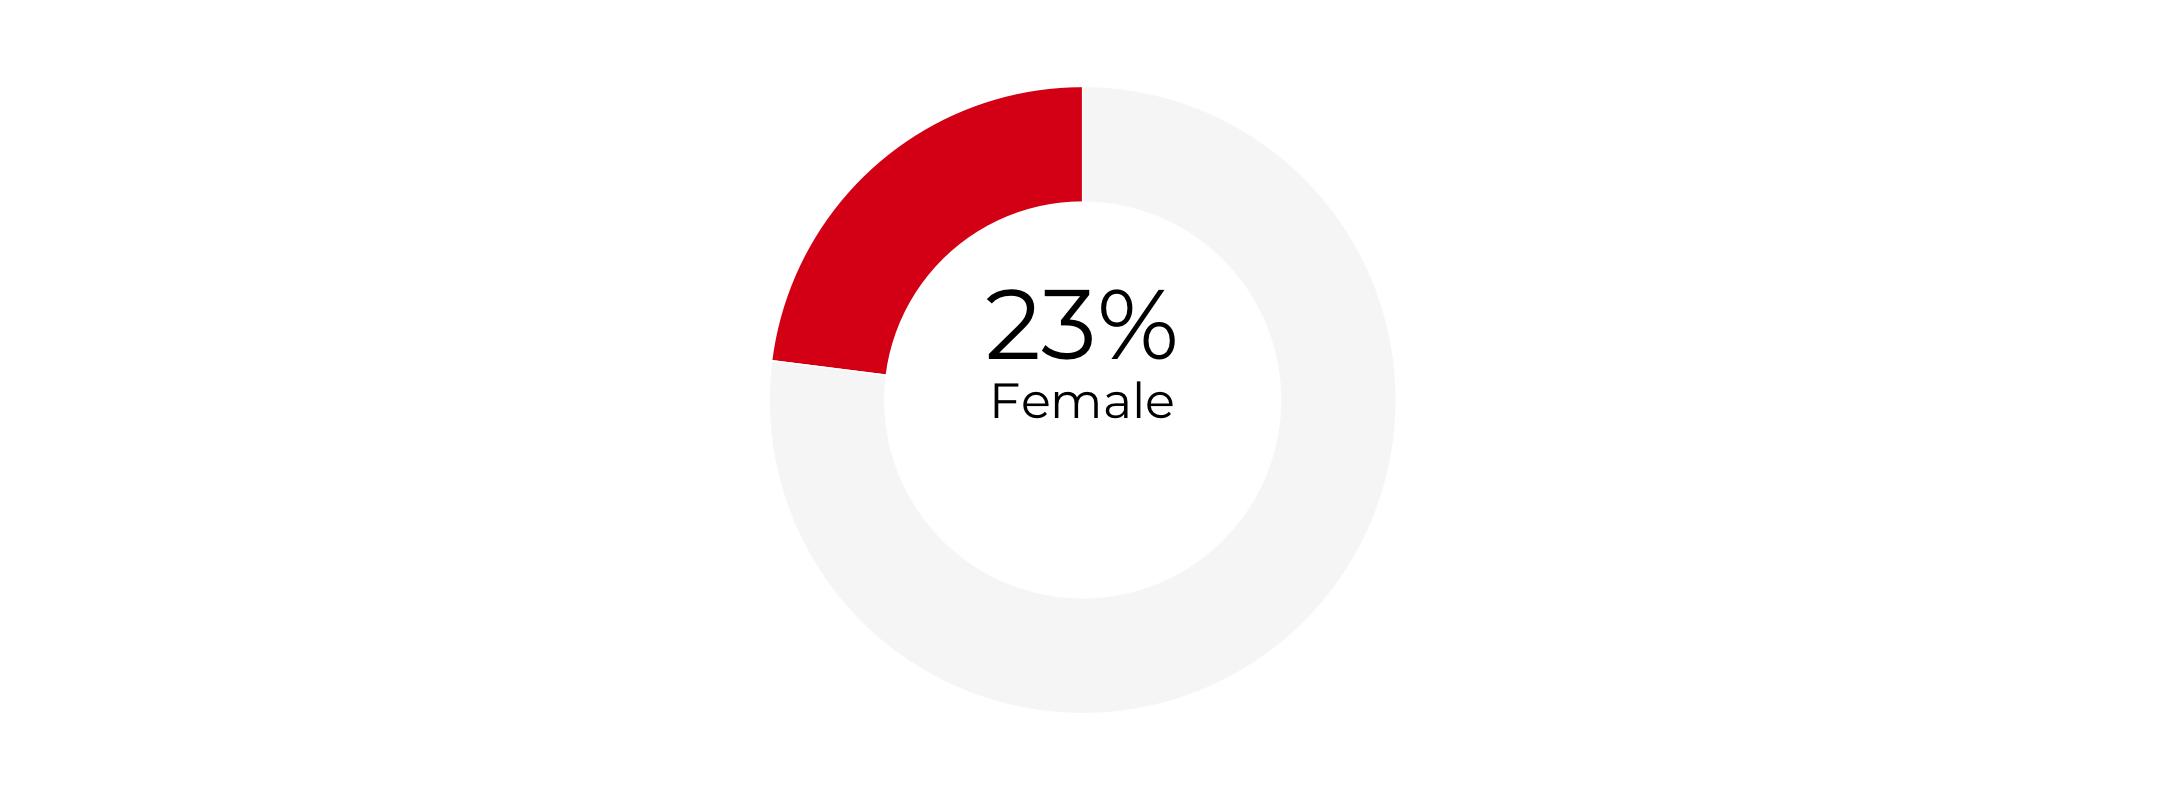 Graph about Gender Composition of Deputy Secretaries of Agriculture. More detailed text description below.